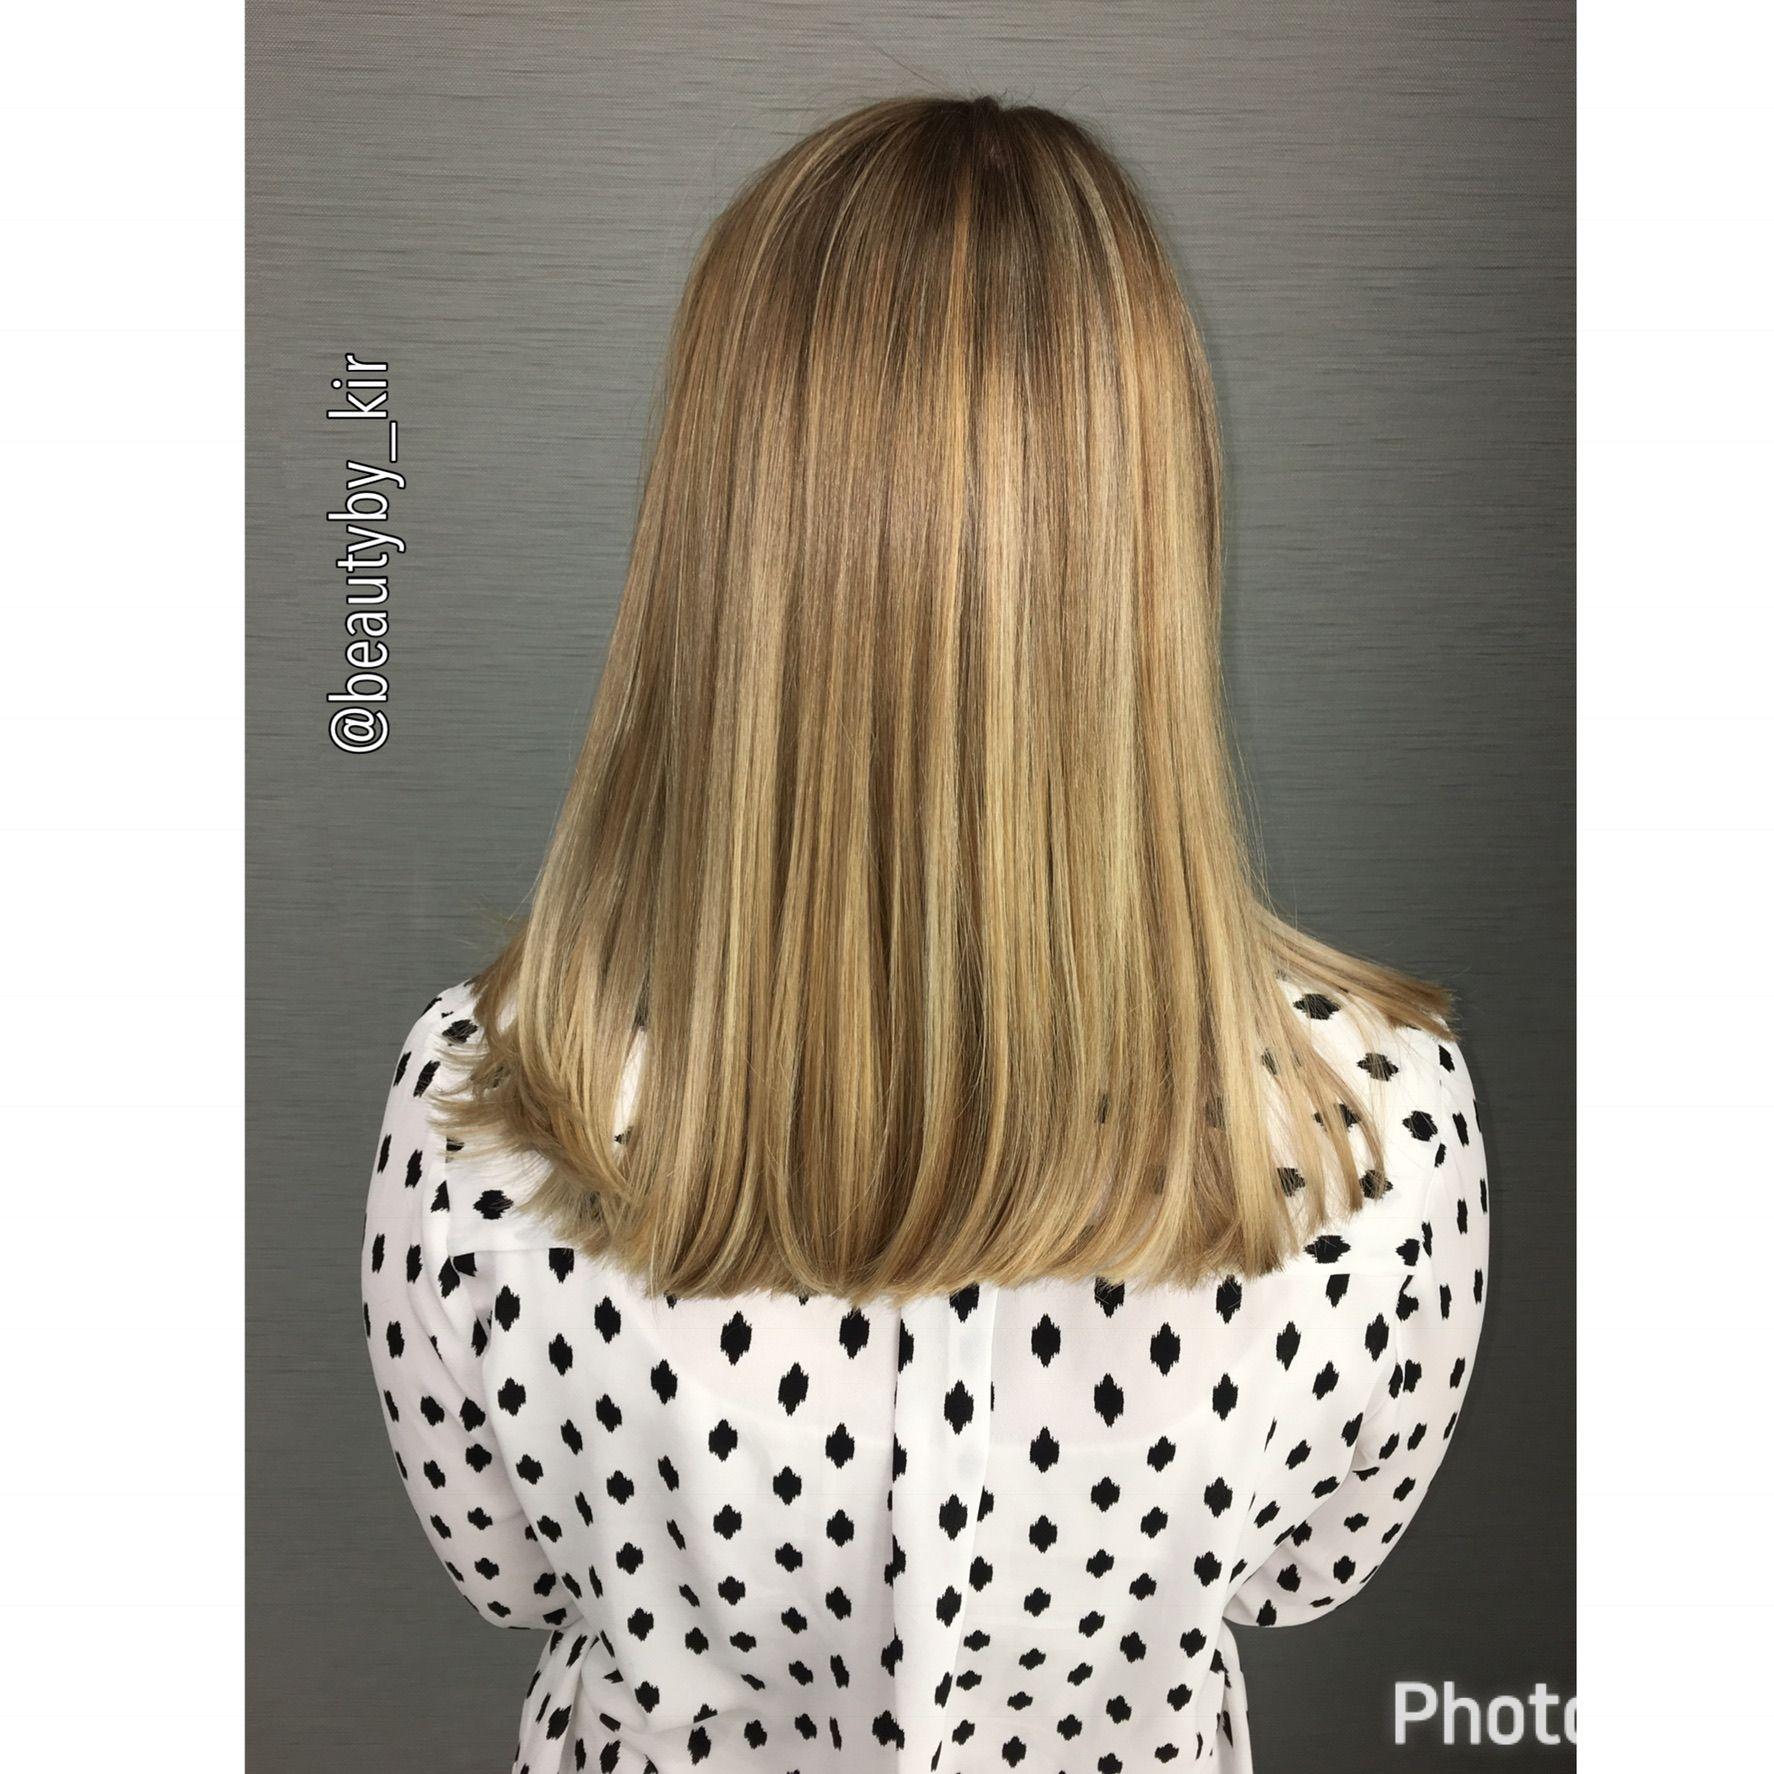 Redken Shades Eq Full Head Hl Long Hair Styles Hair Styles Redken Shades